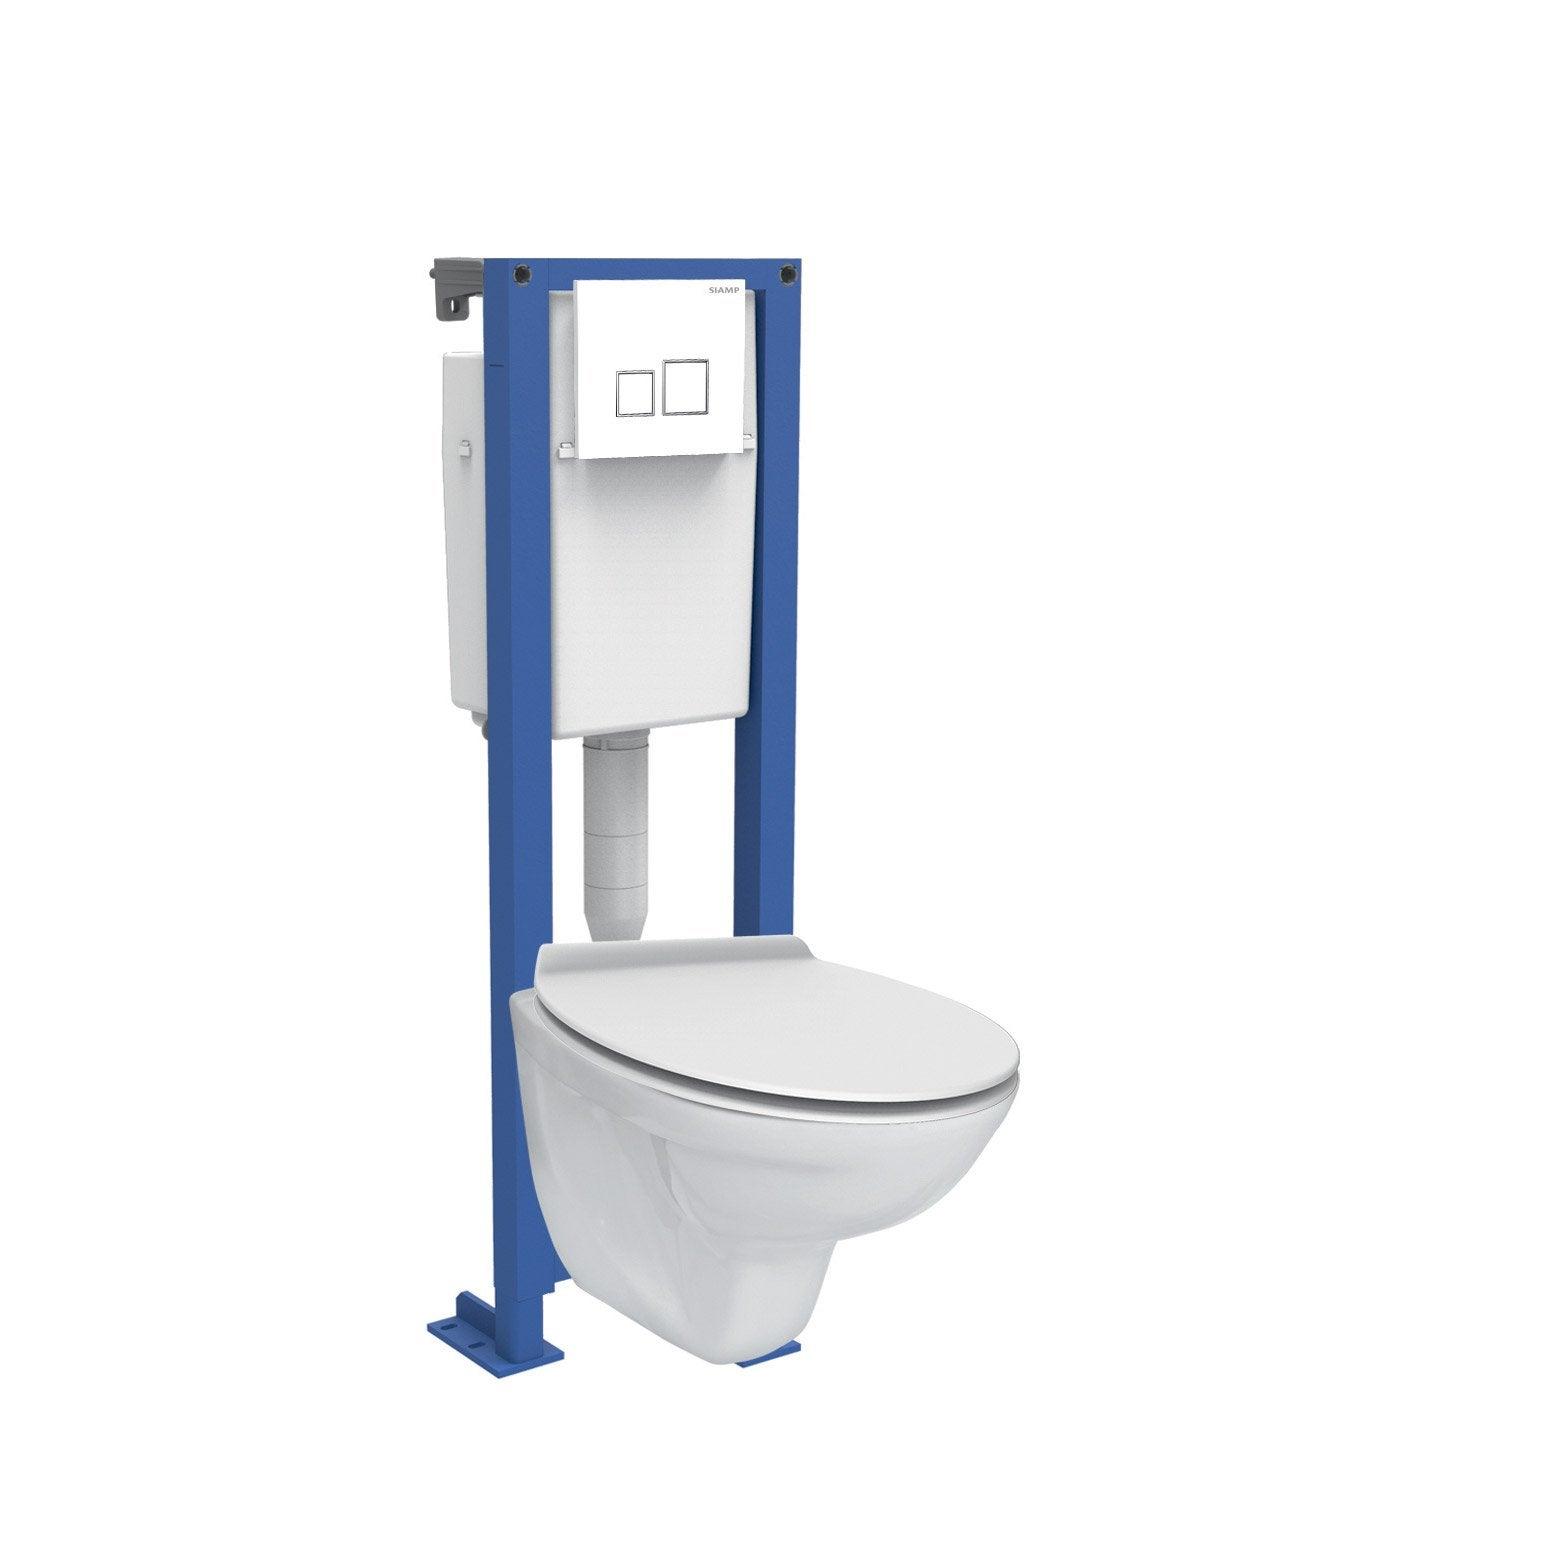 Comment Installer Toilette Suspendu pack wc suspendu bâti universel verticale saphir siamp